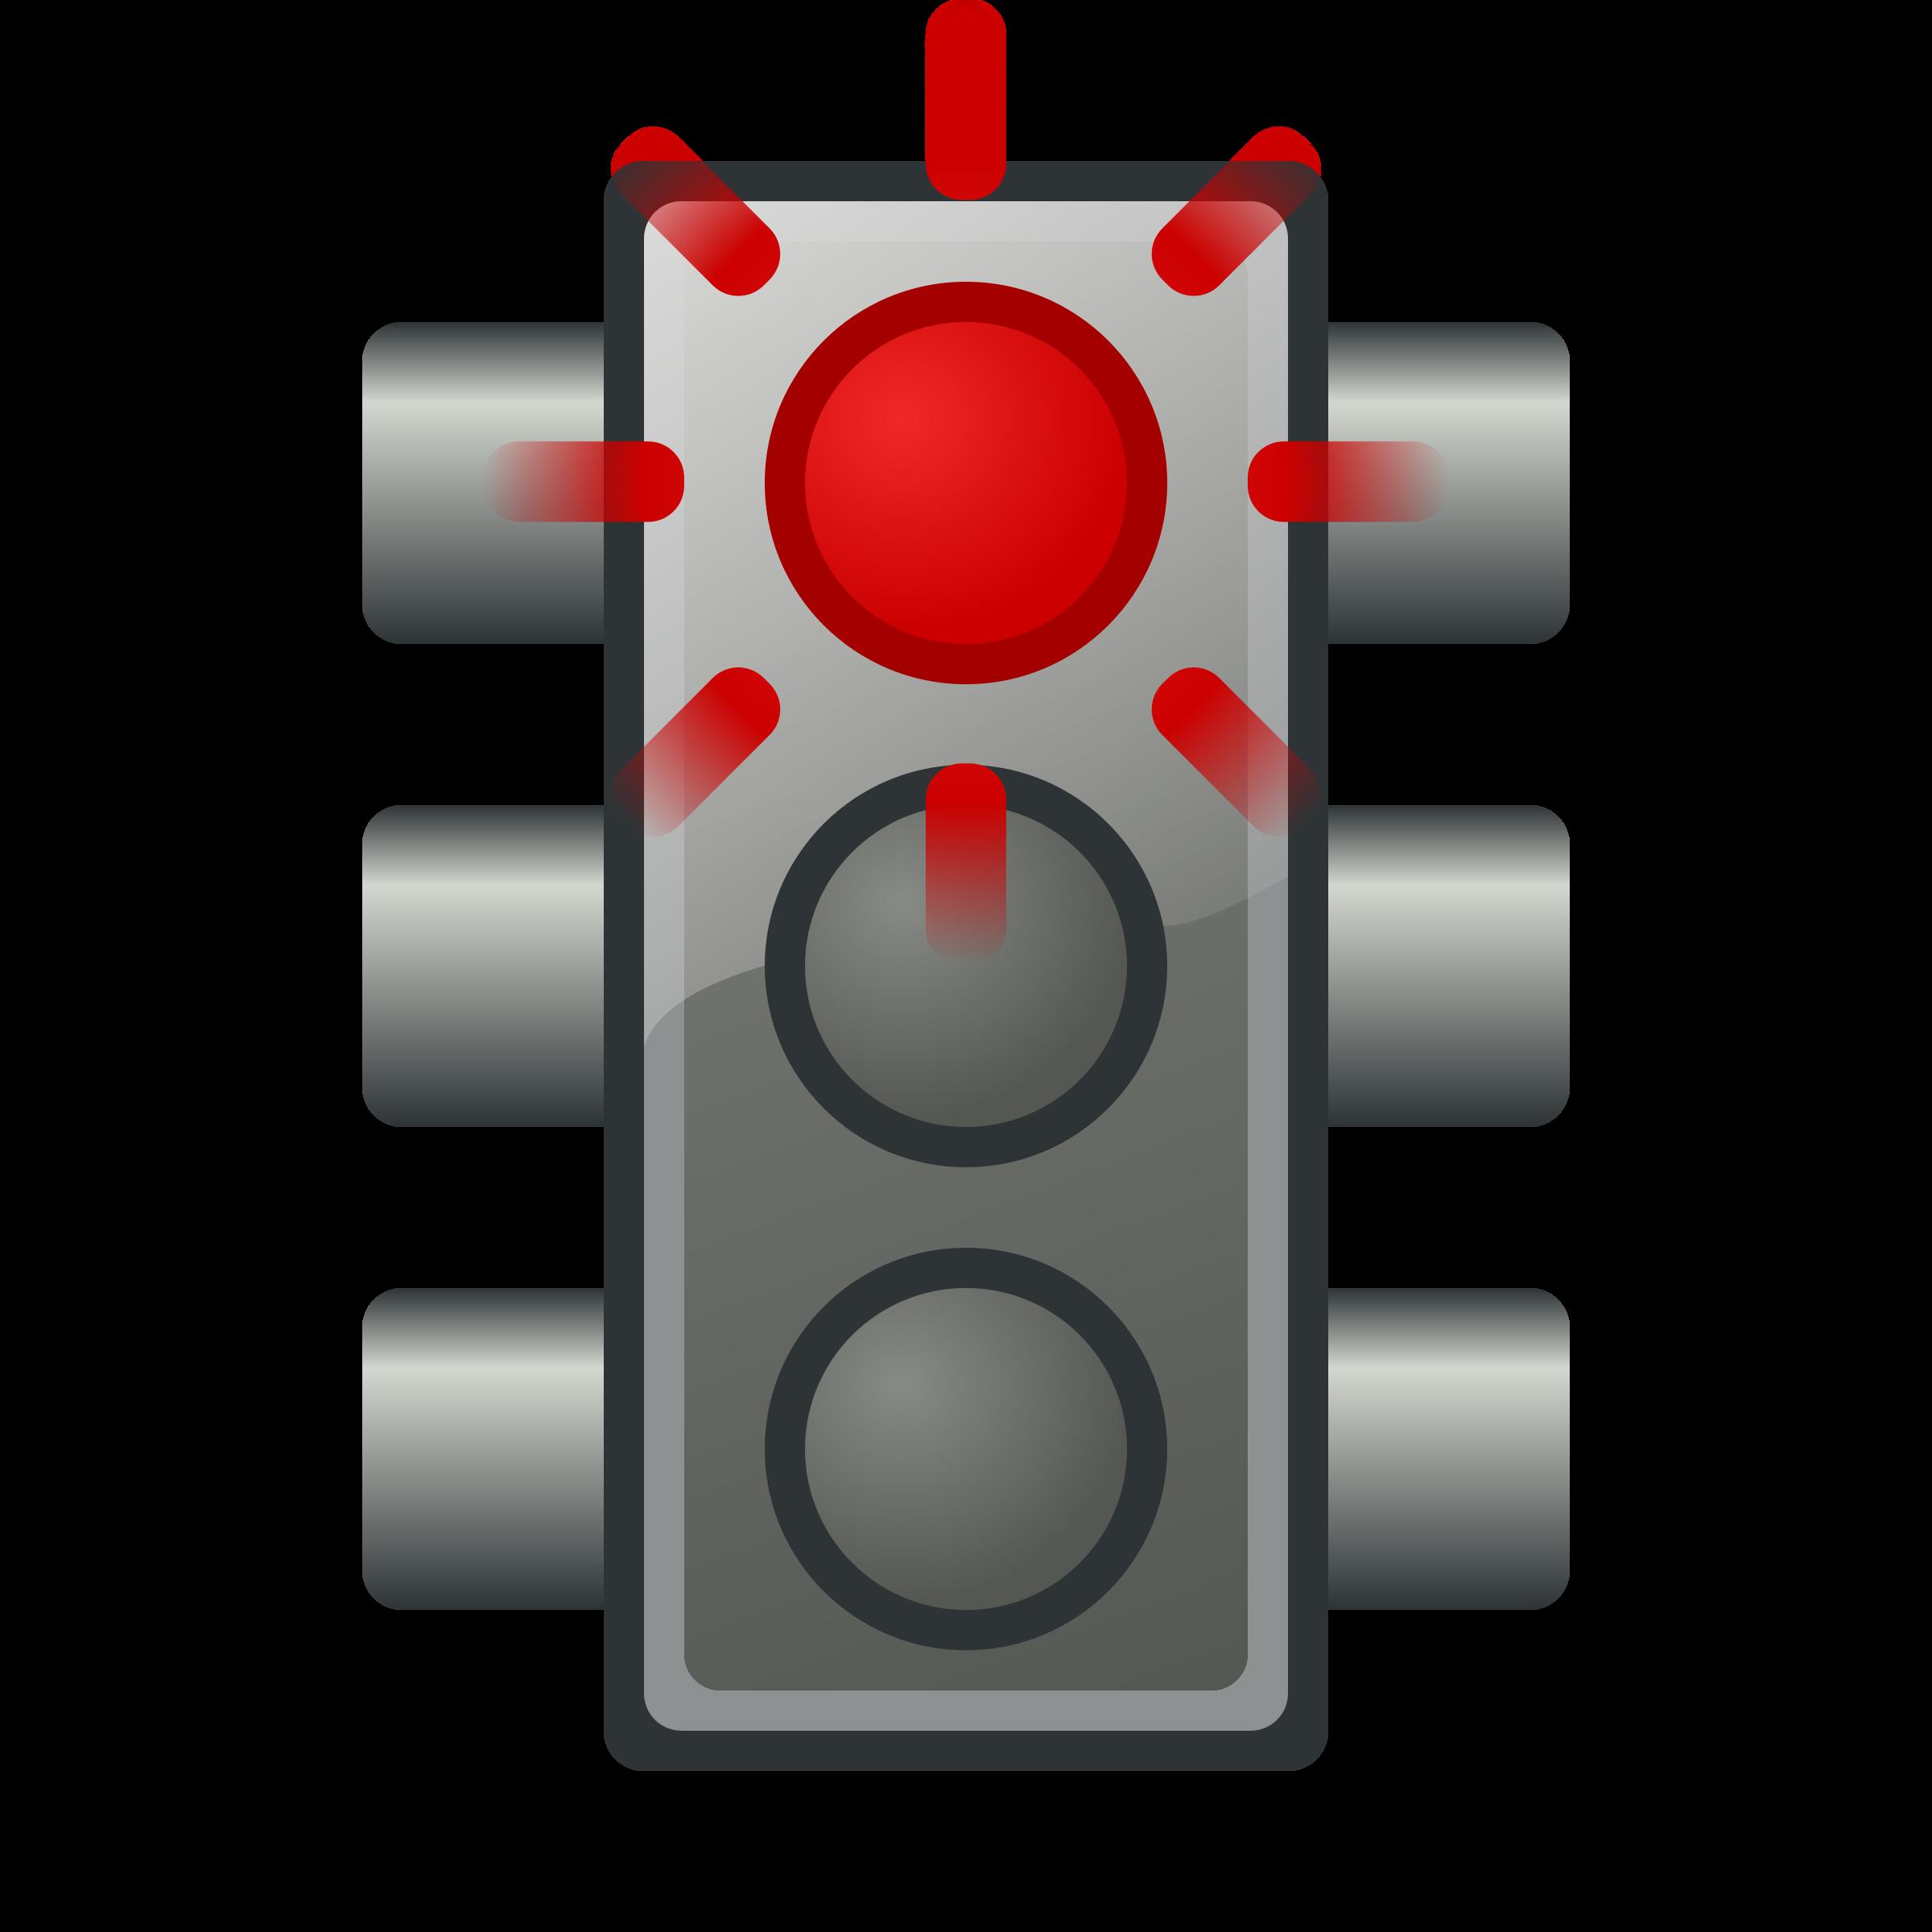 Traffic Light clipart red Clipart light Flashing red traffic